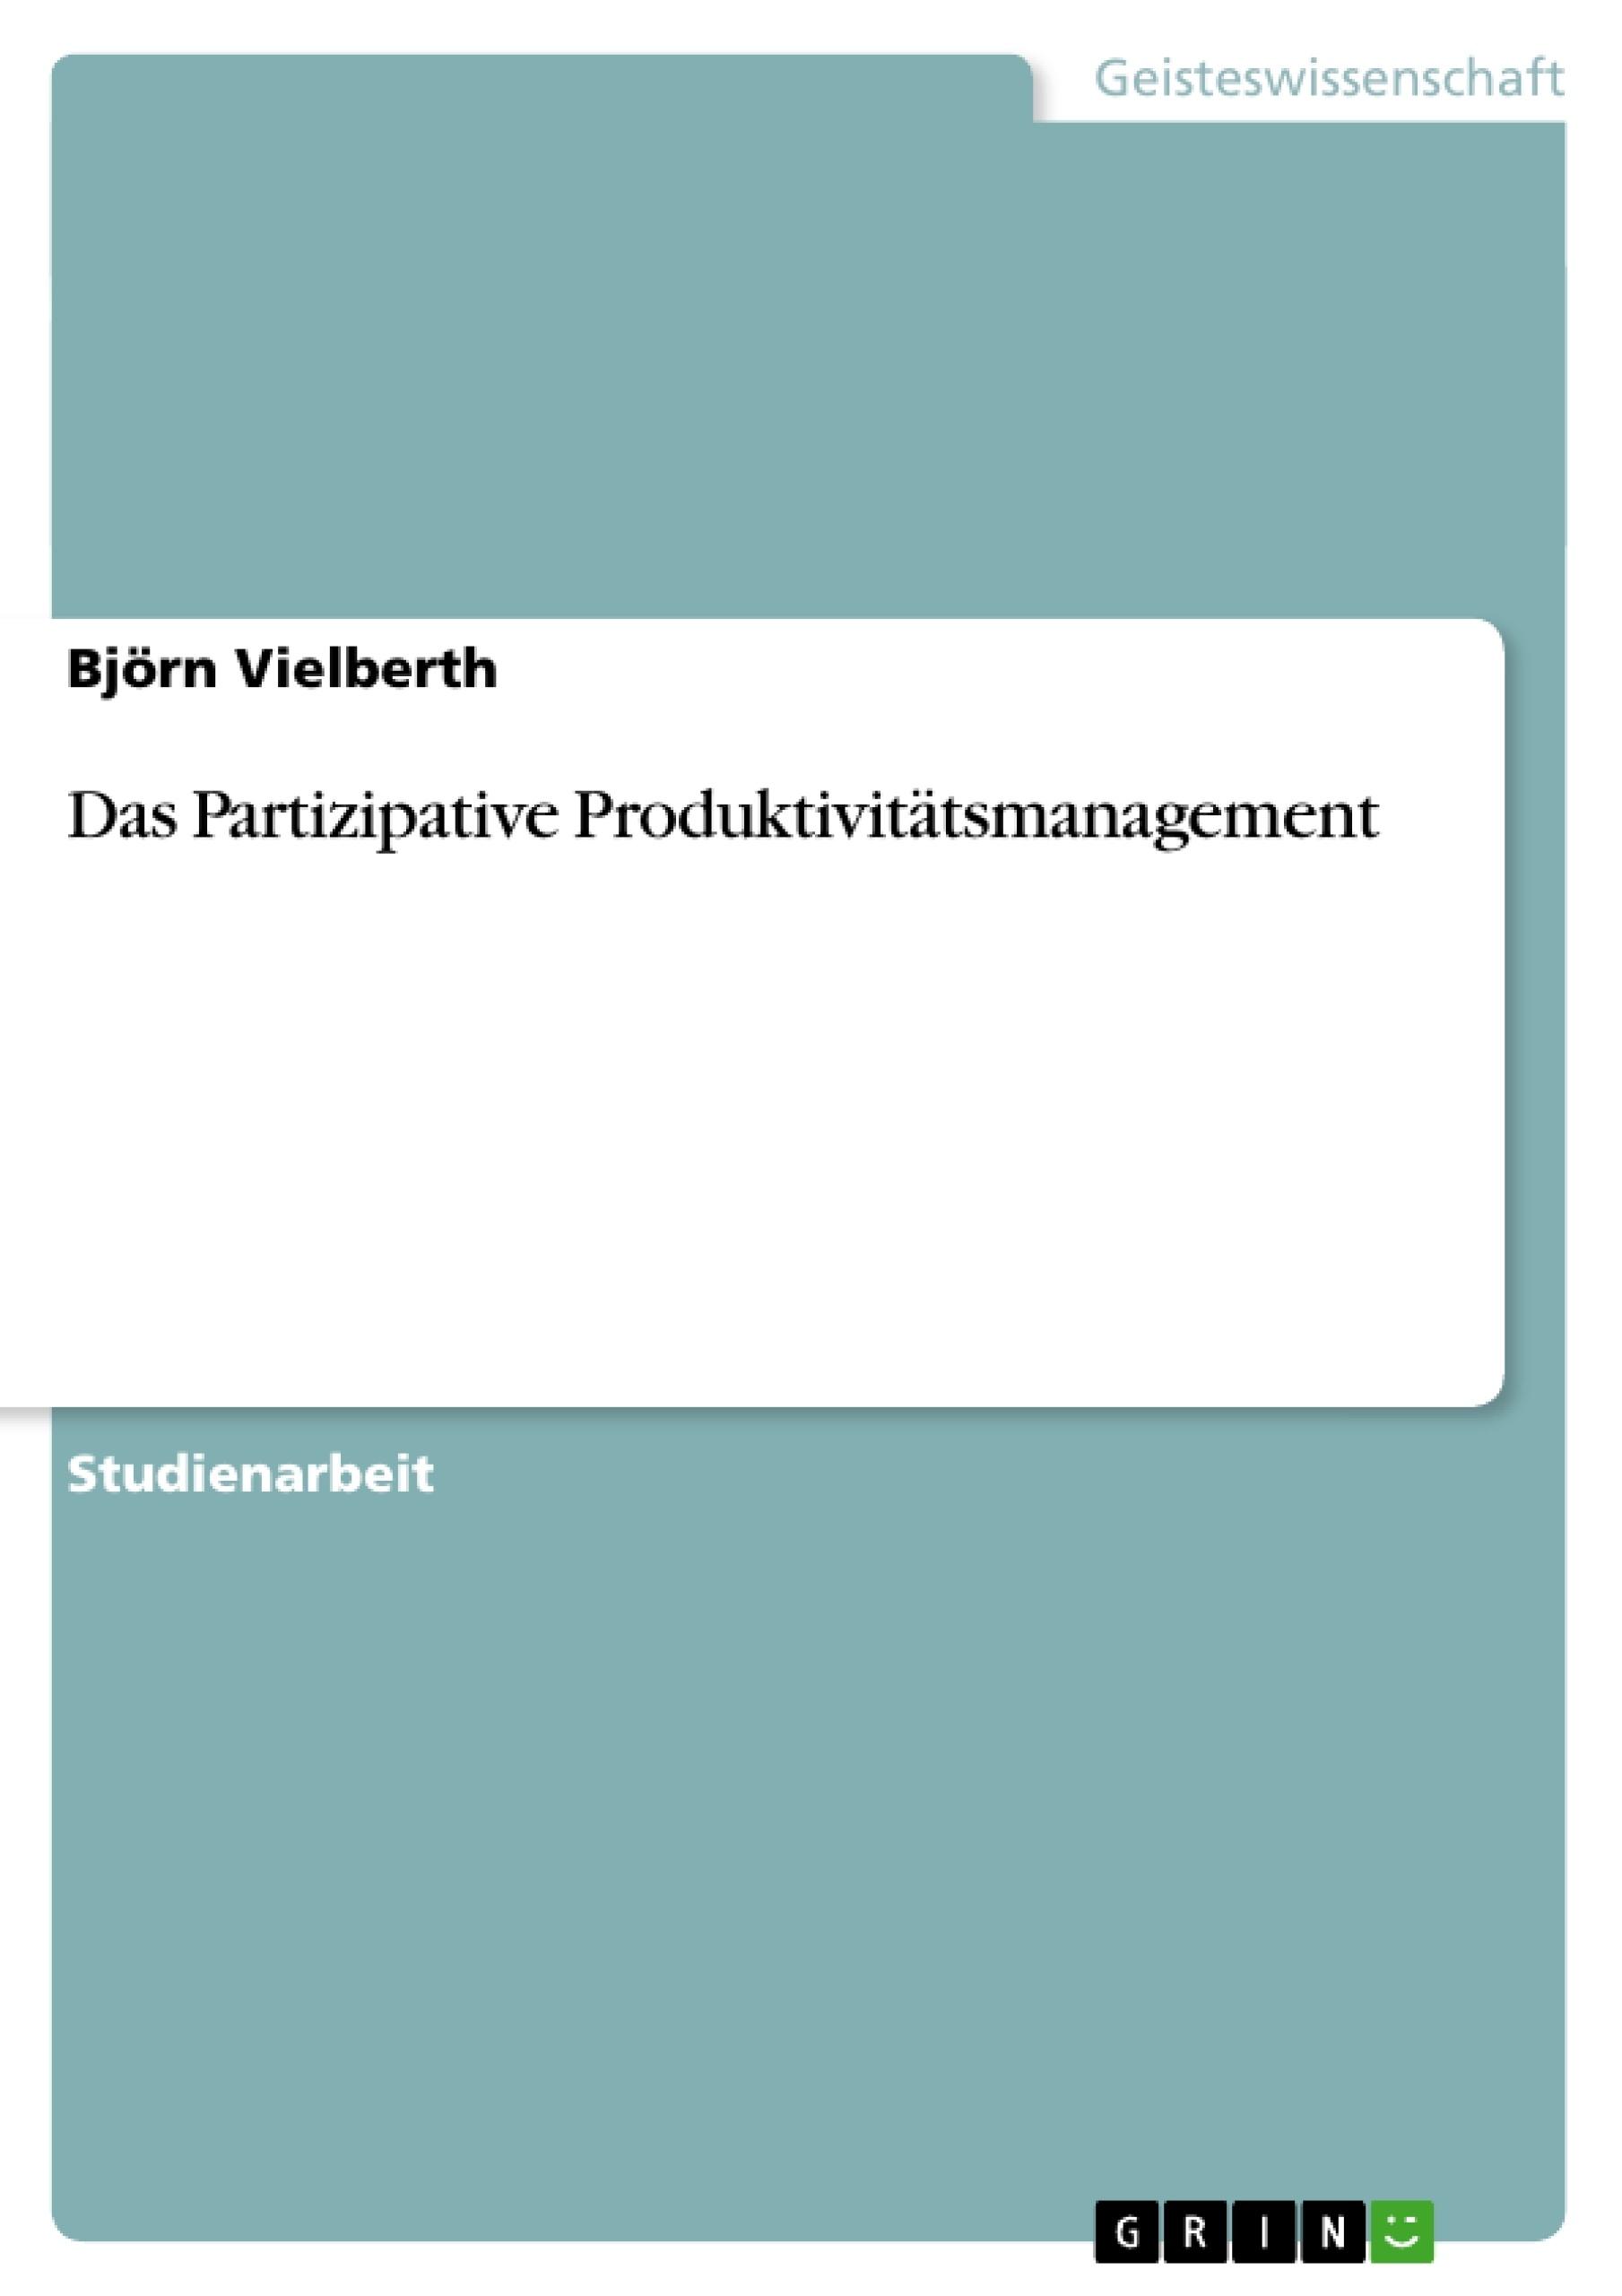 Titel: Das Partizipative Produktivitätsmanagement